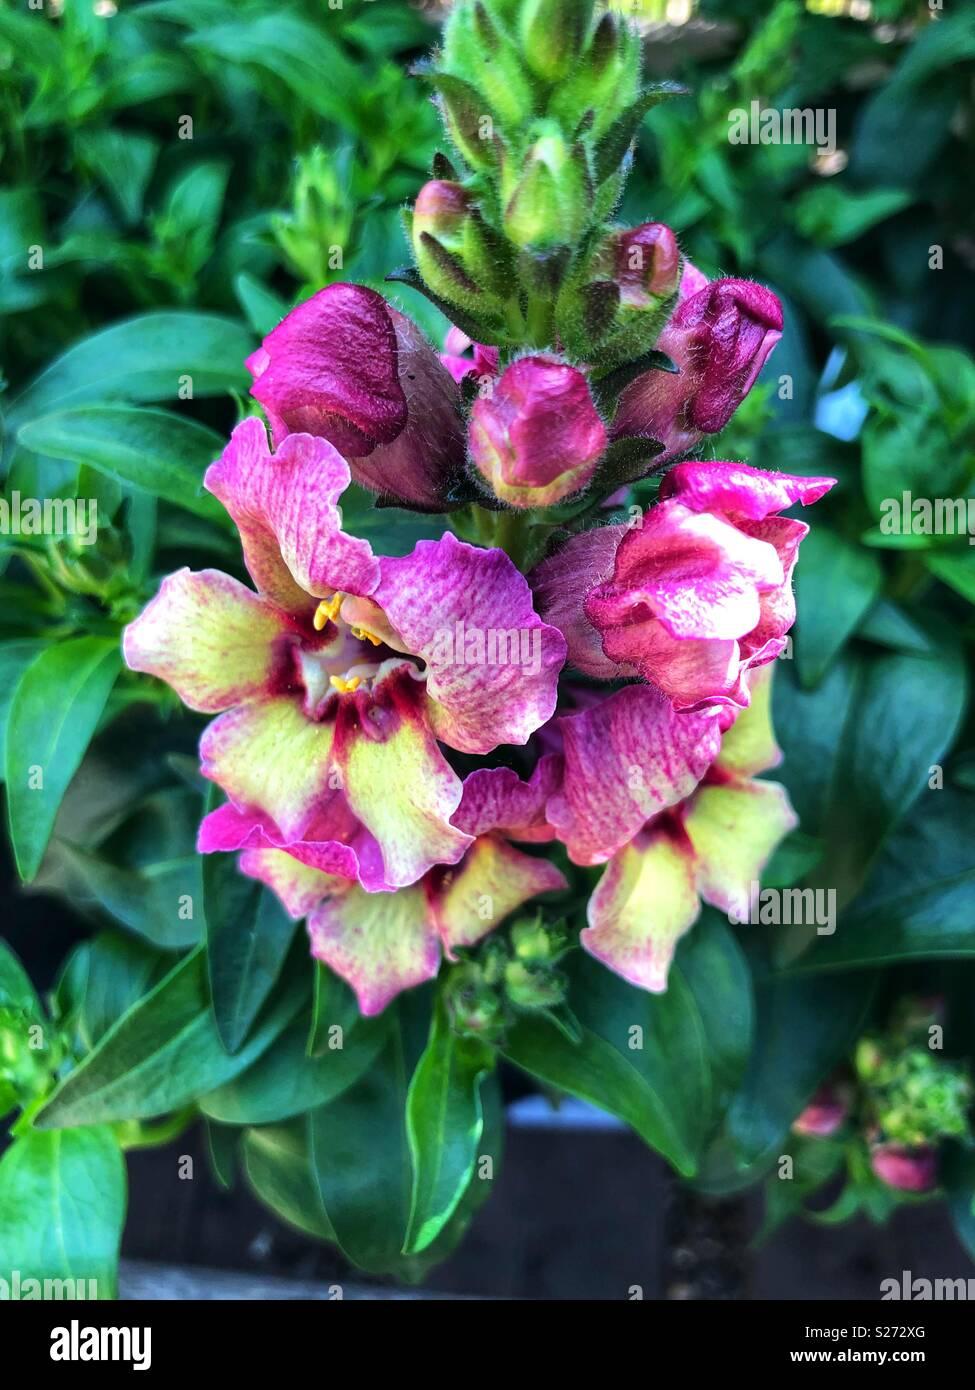 antirrhinum peachy pink and yellow flowers - Stock Image